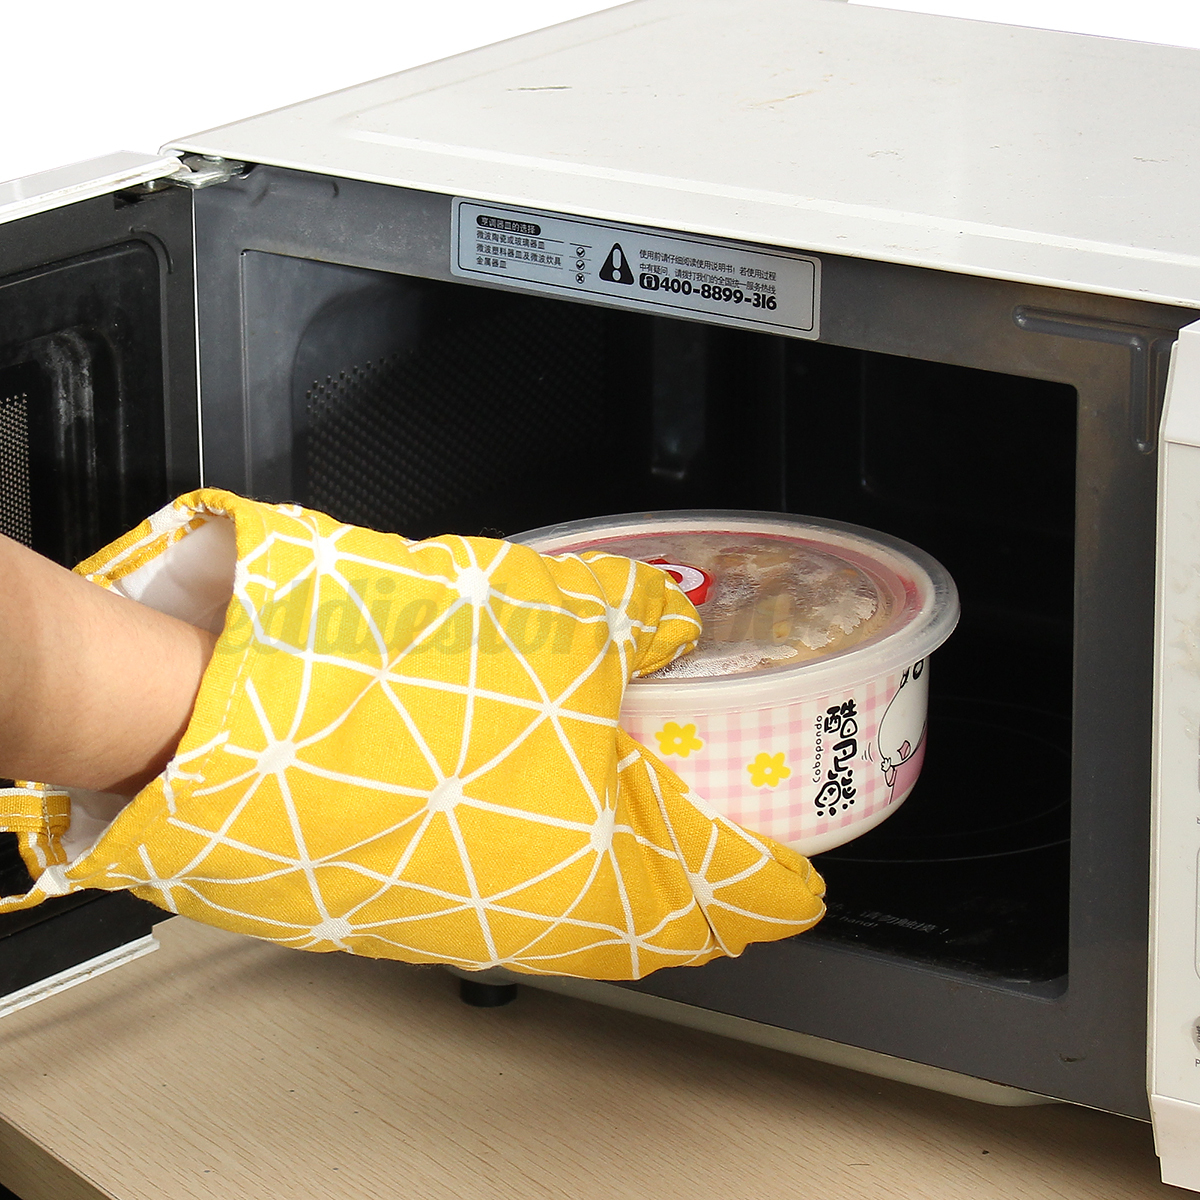 Kitchen Oven Mitts ~ Pair padded oven gloves kitchen baking cook mitt thick